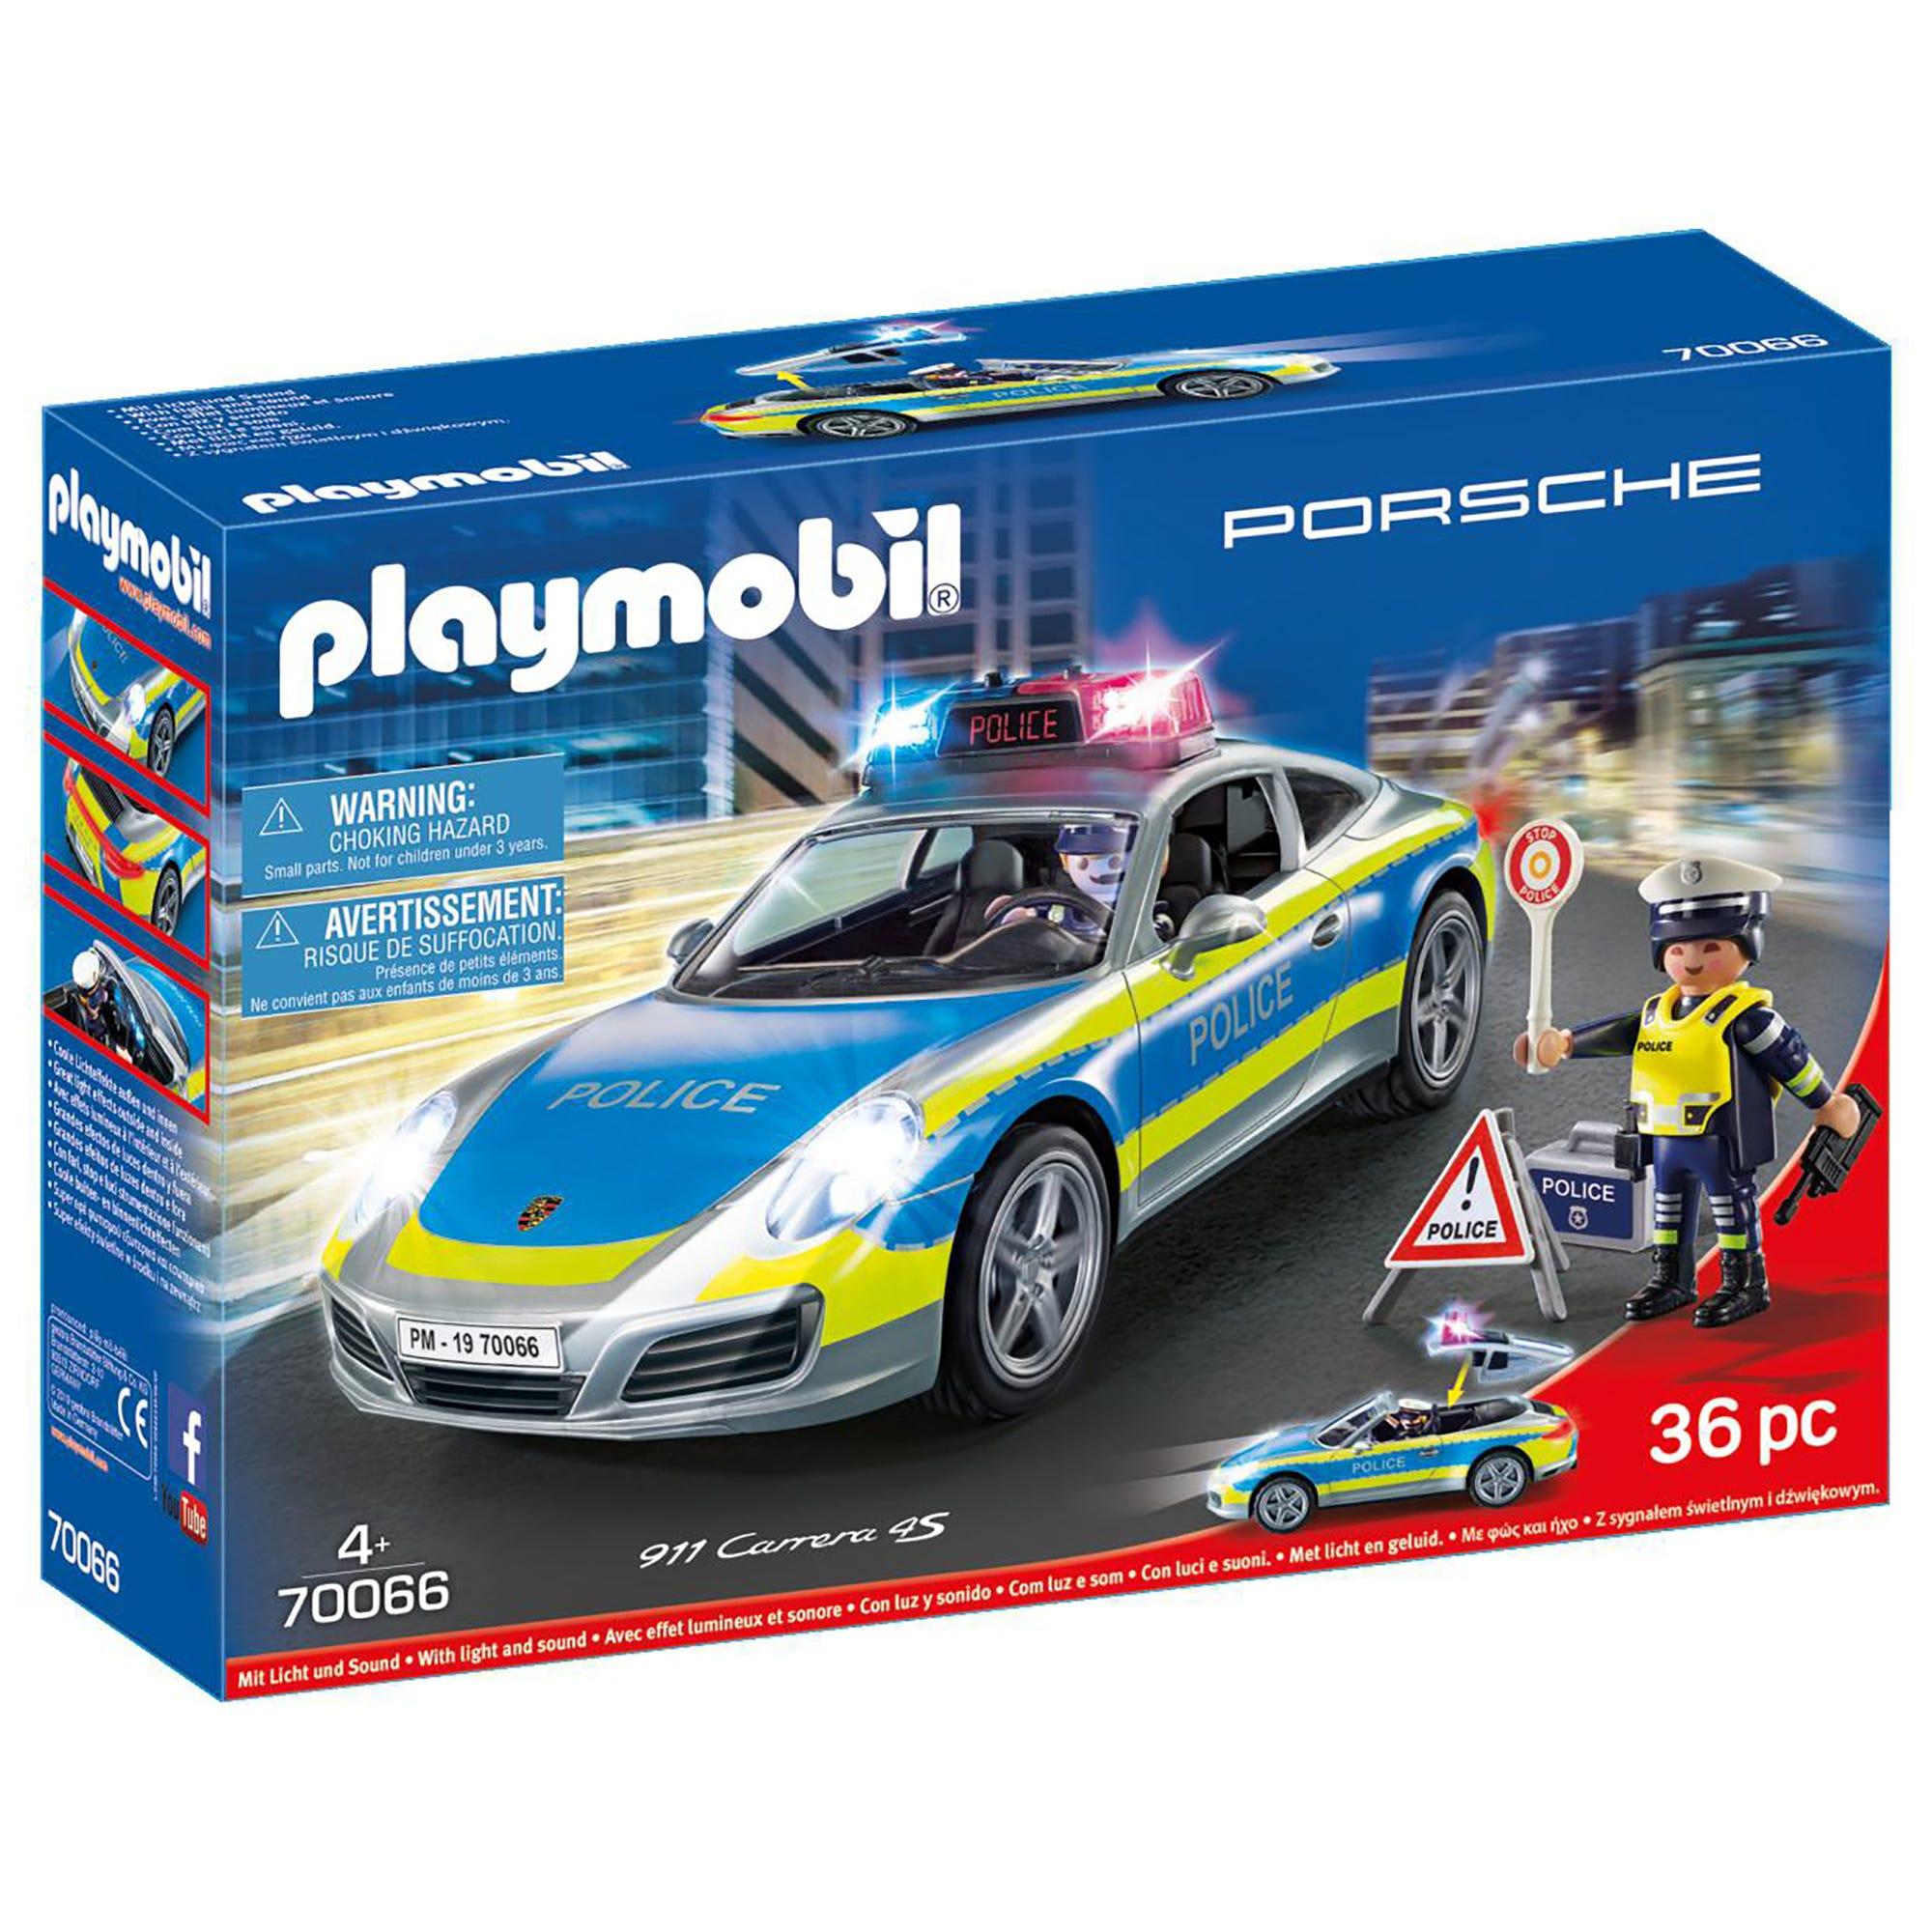 Playmobil 70066 Porsche 911 Carrera 4S Police